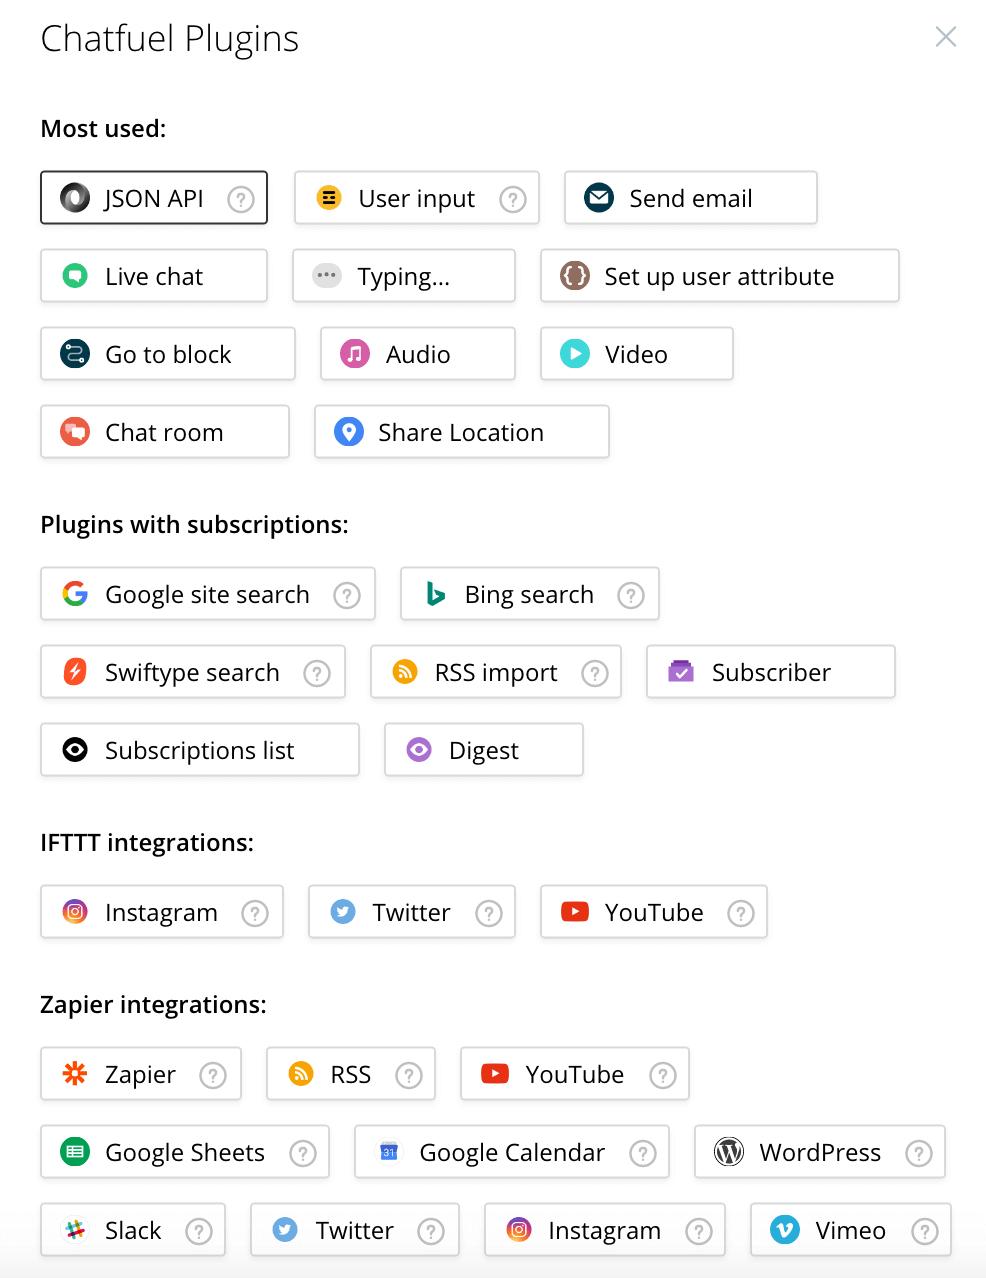 List of Chatfuel Plugins